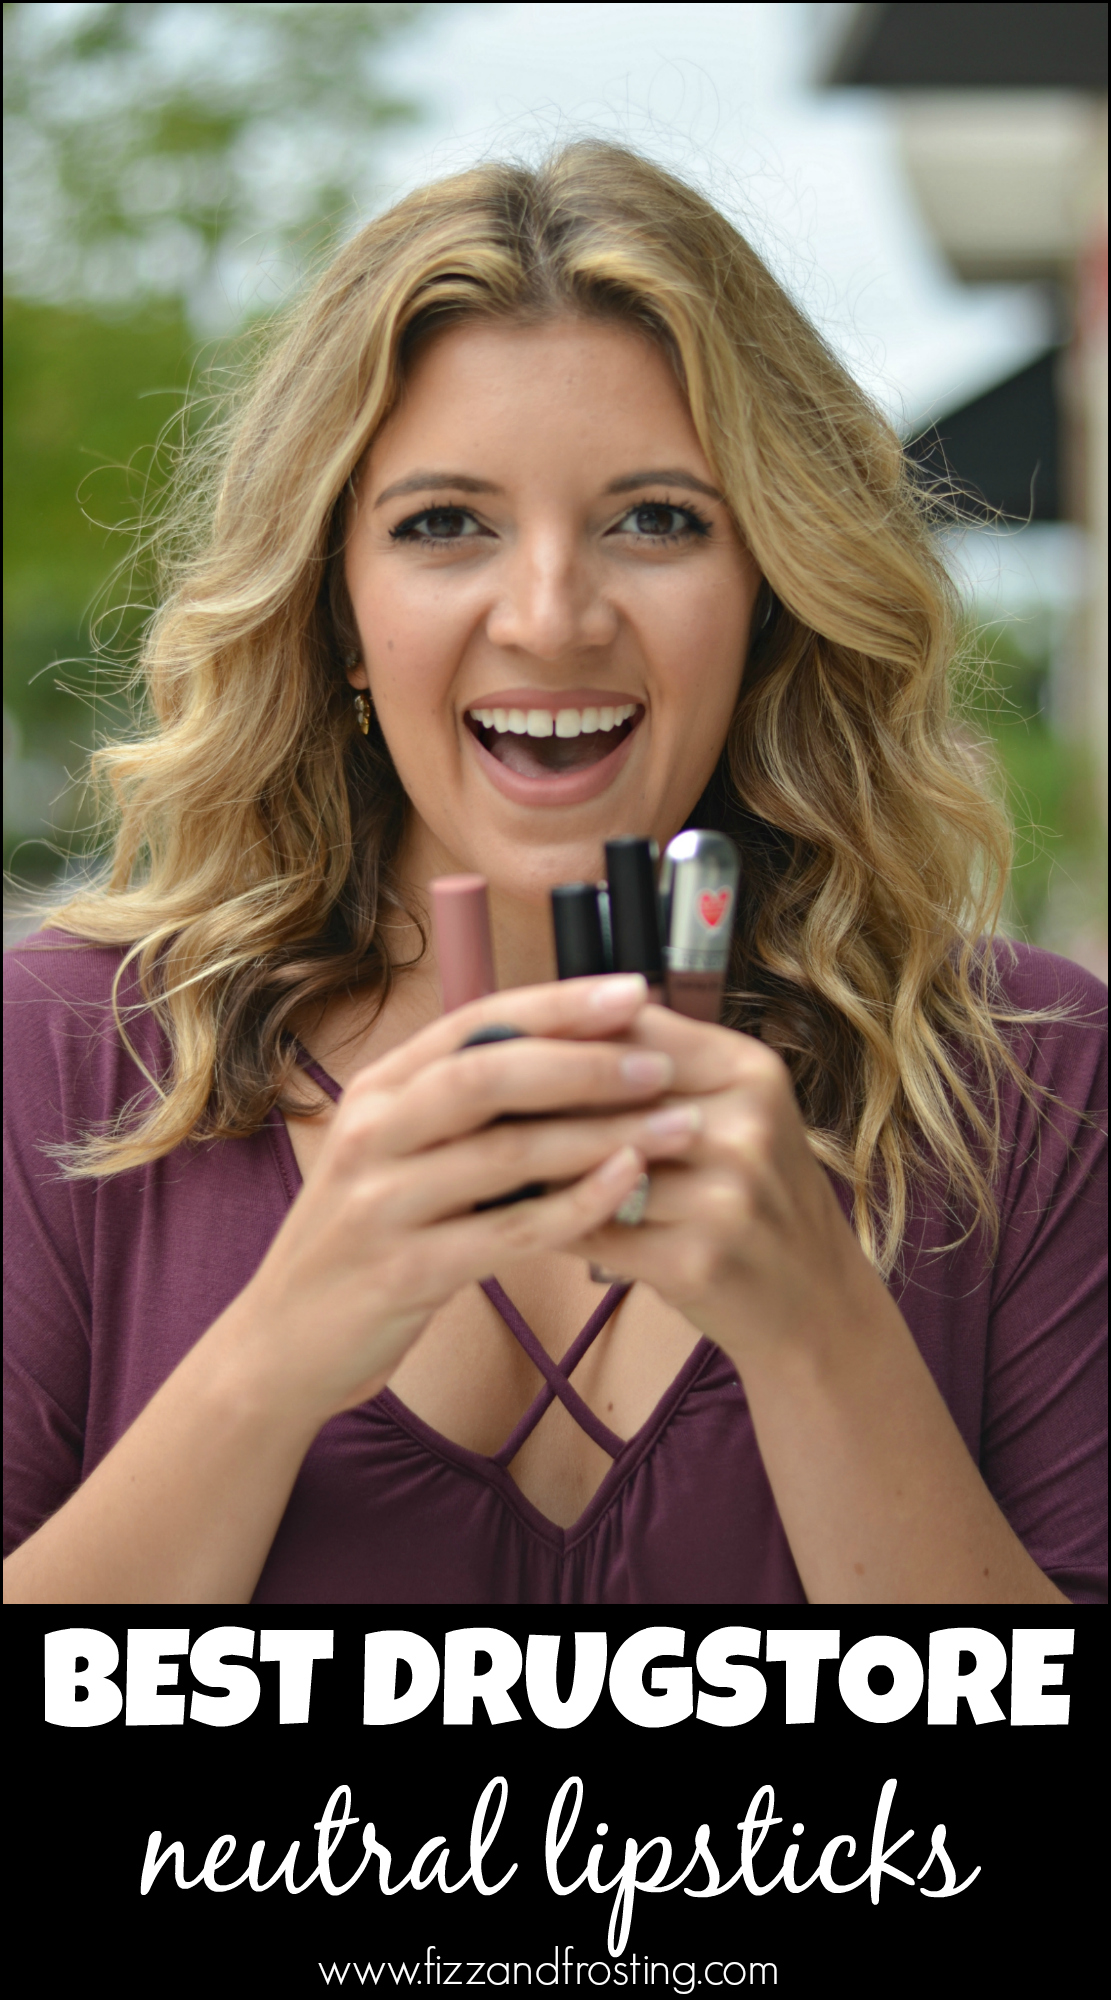 best nude drugstore lipsticks | www.fizzandfrosting.com